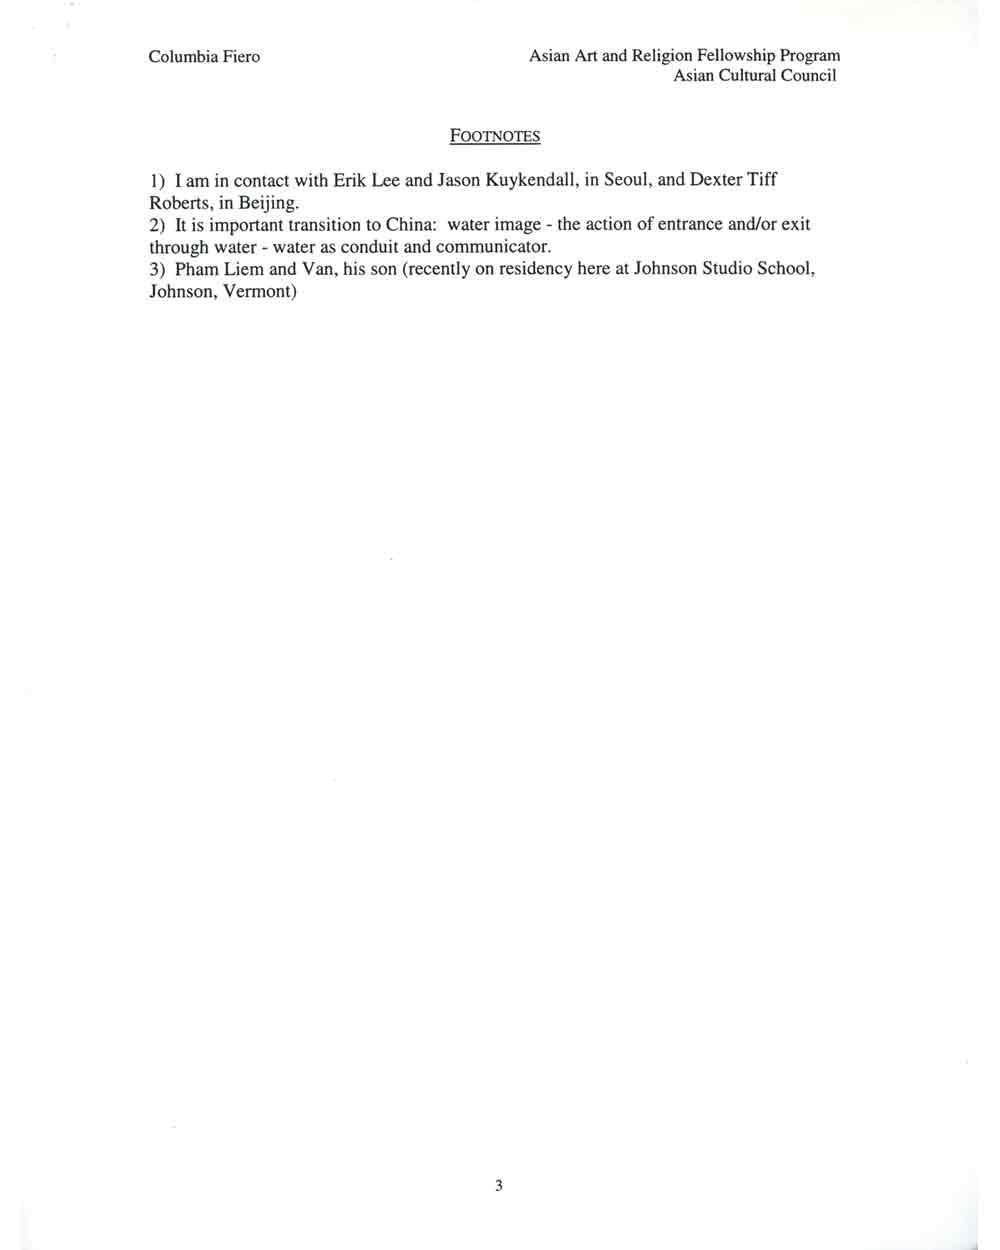 Columbia Fiero's Proposal, pg 3